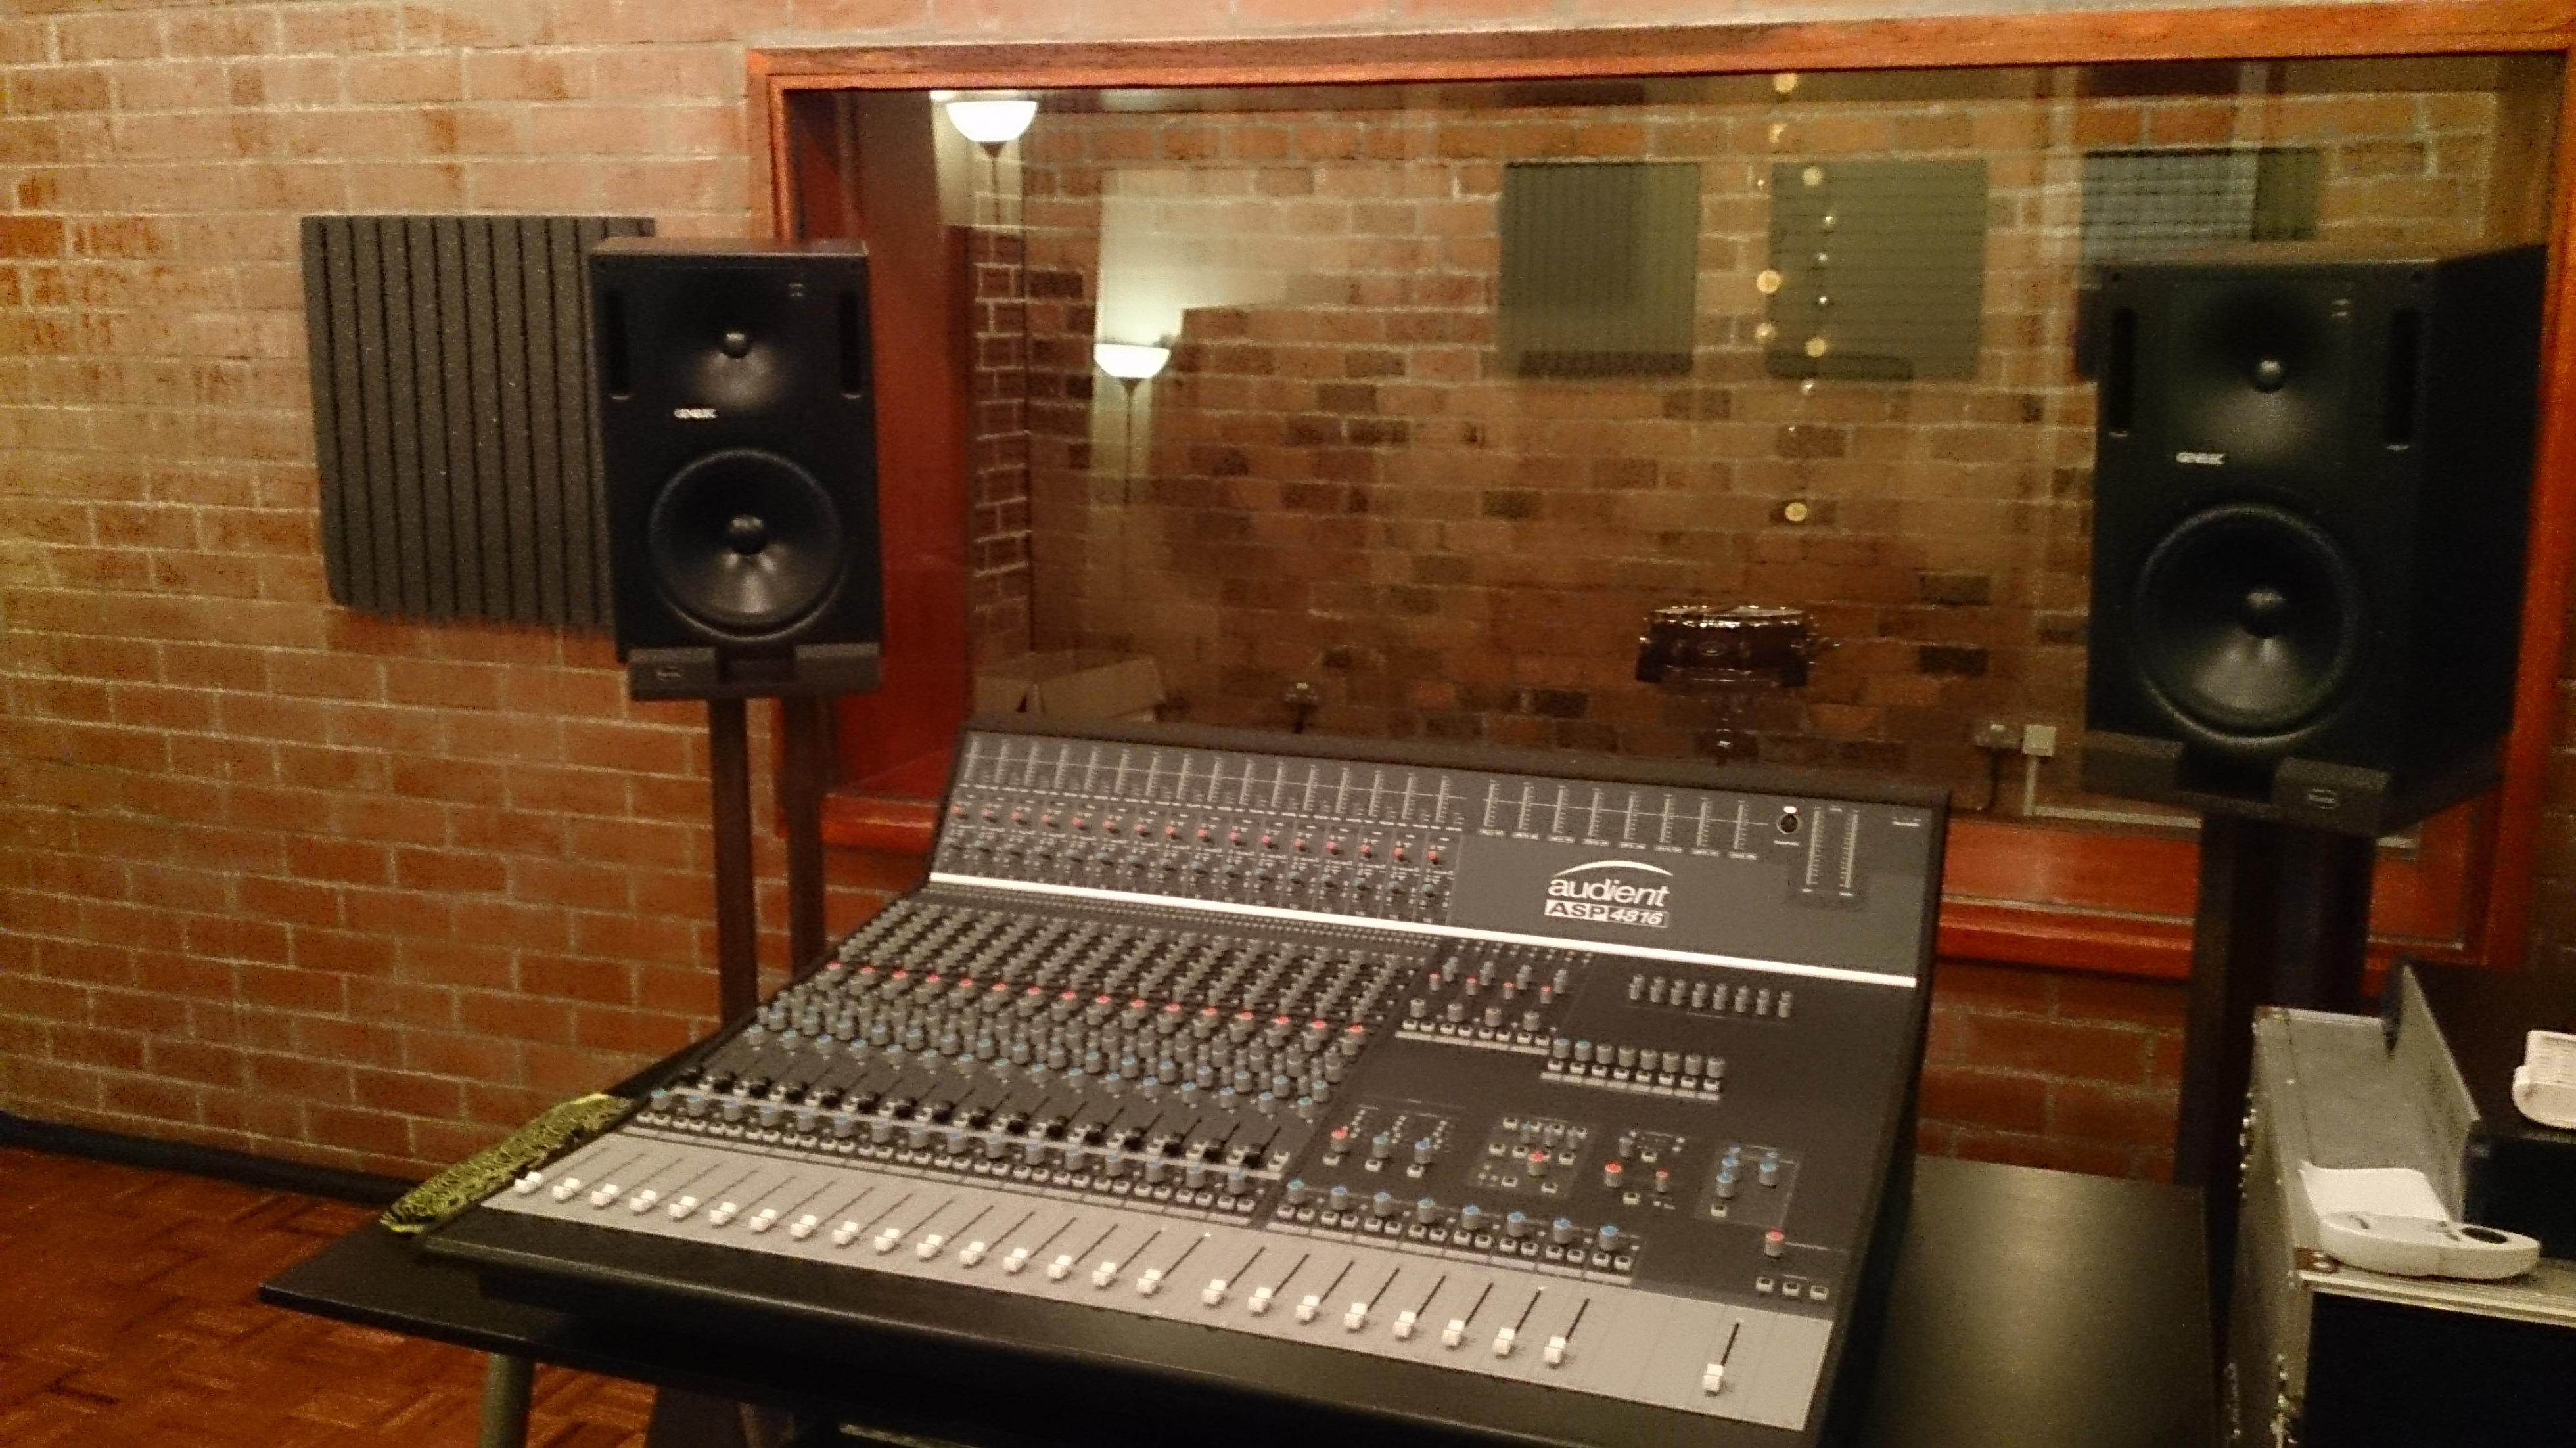 BSYNC RECORDING STUDIO